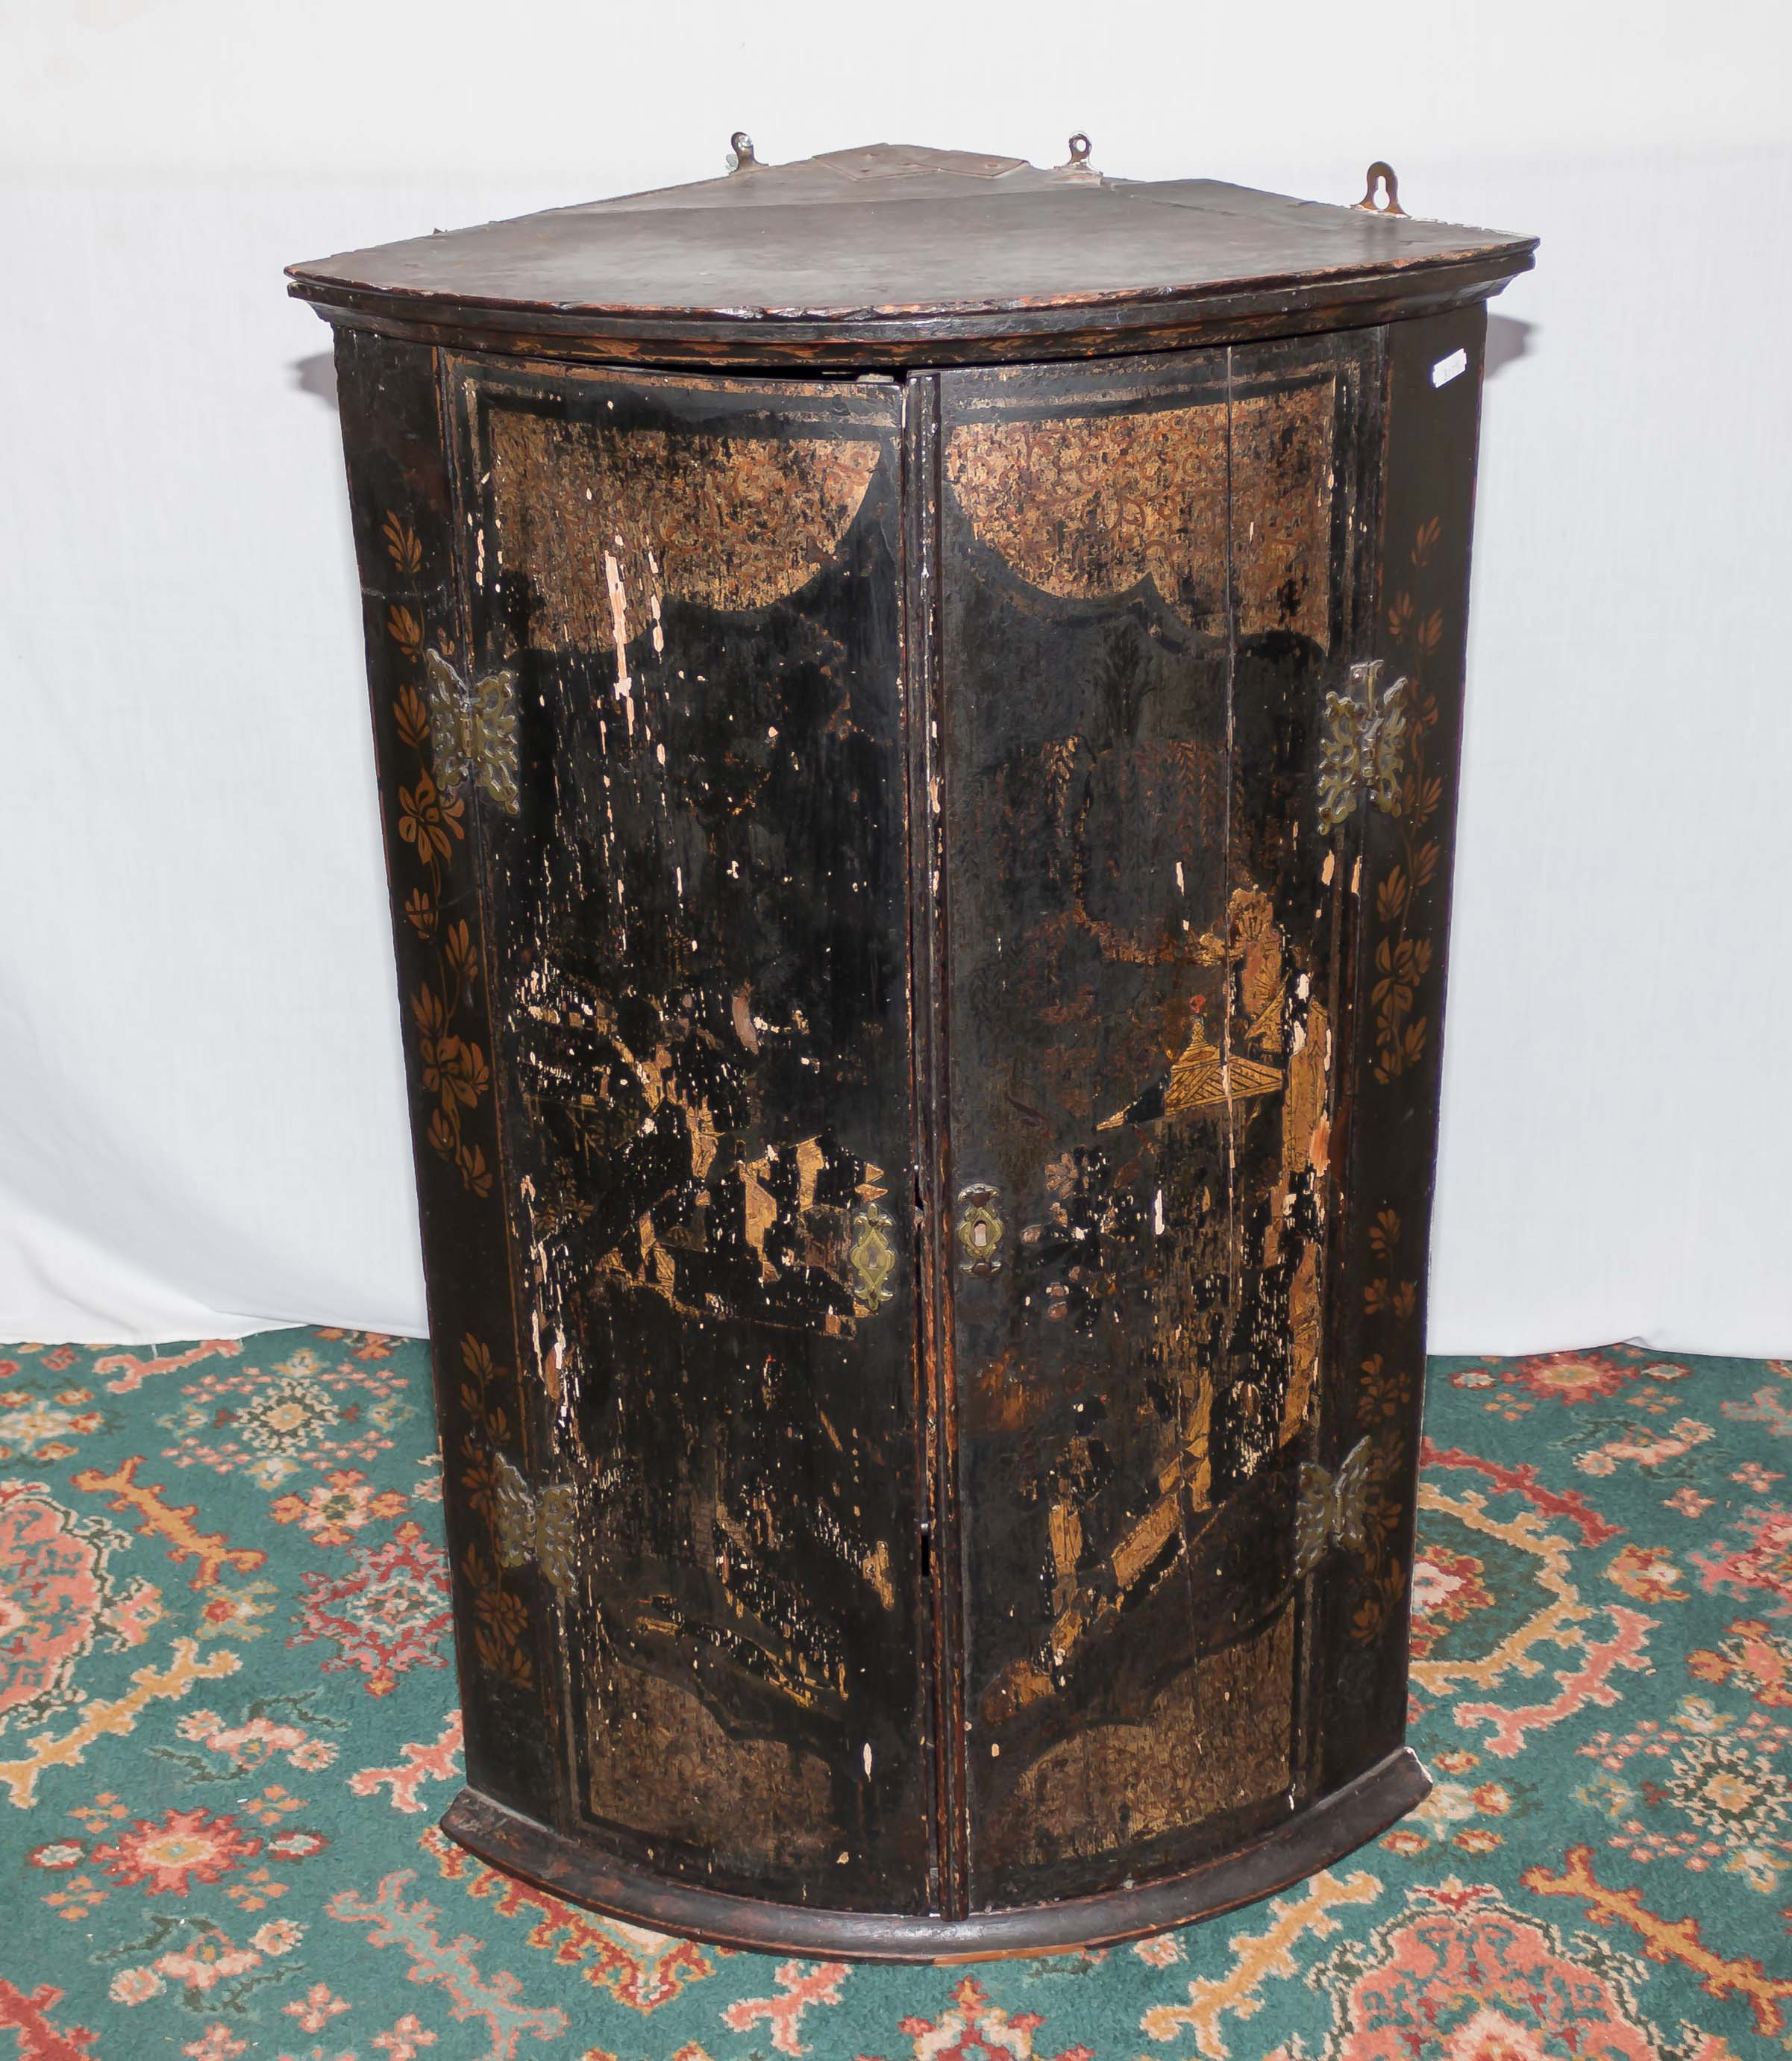 Lot 1 - A period oak lacquered corner cabinet, distressed